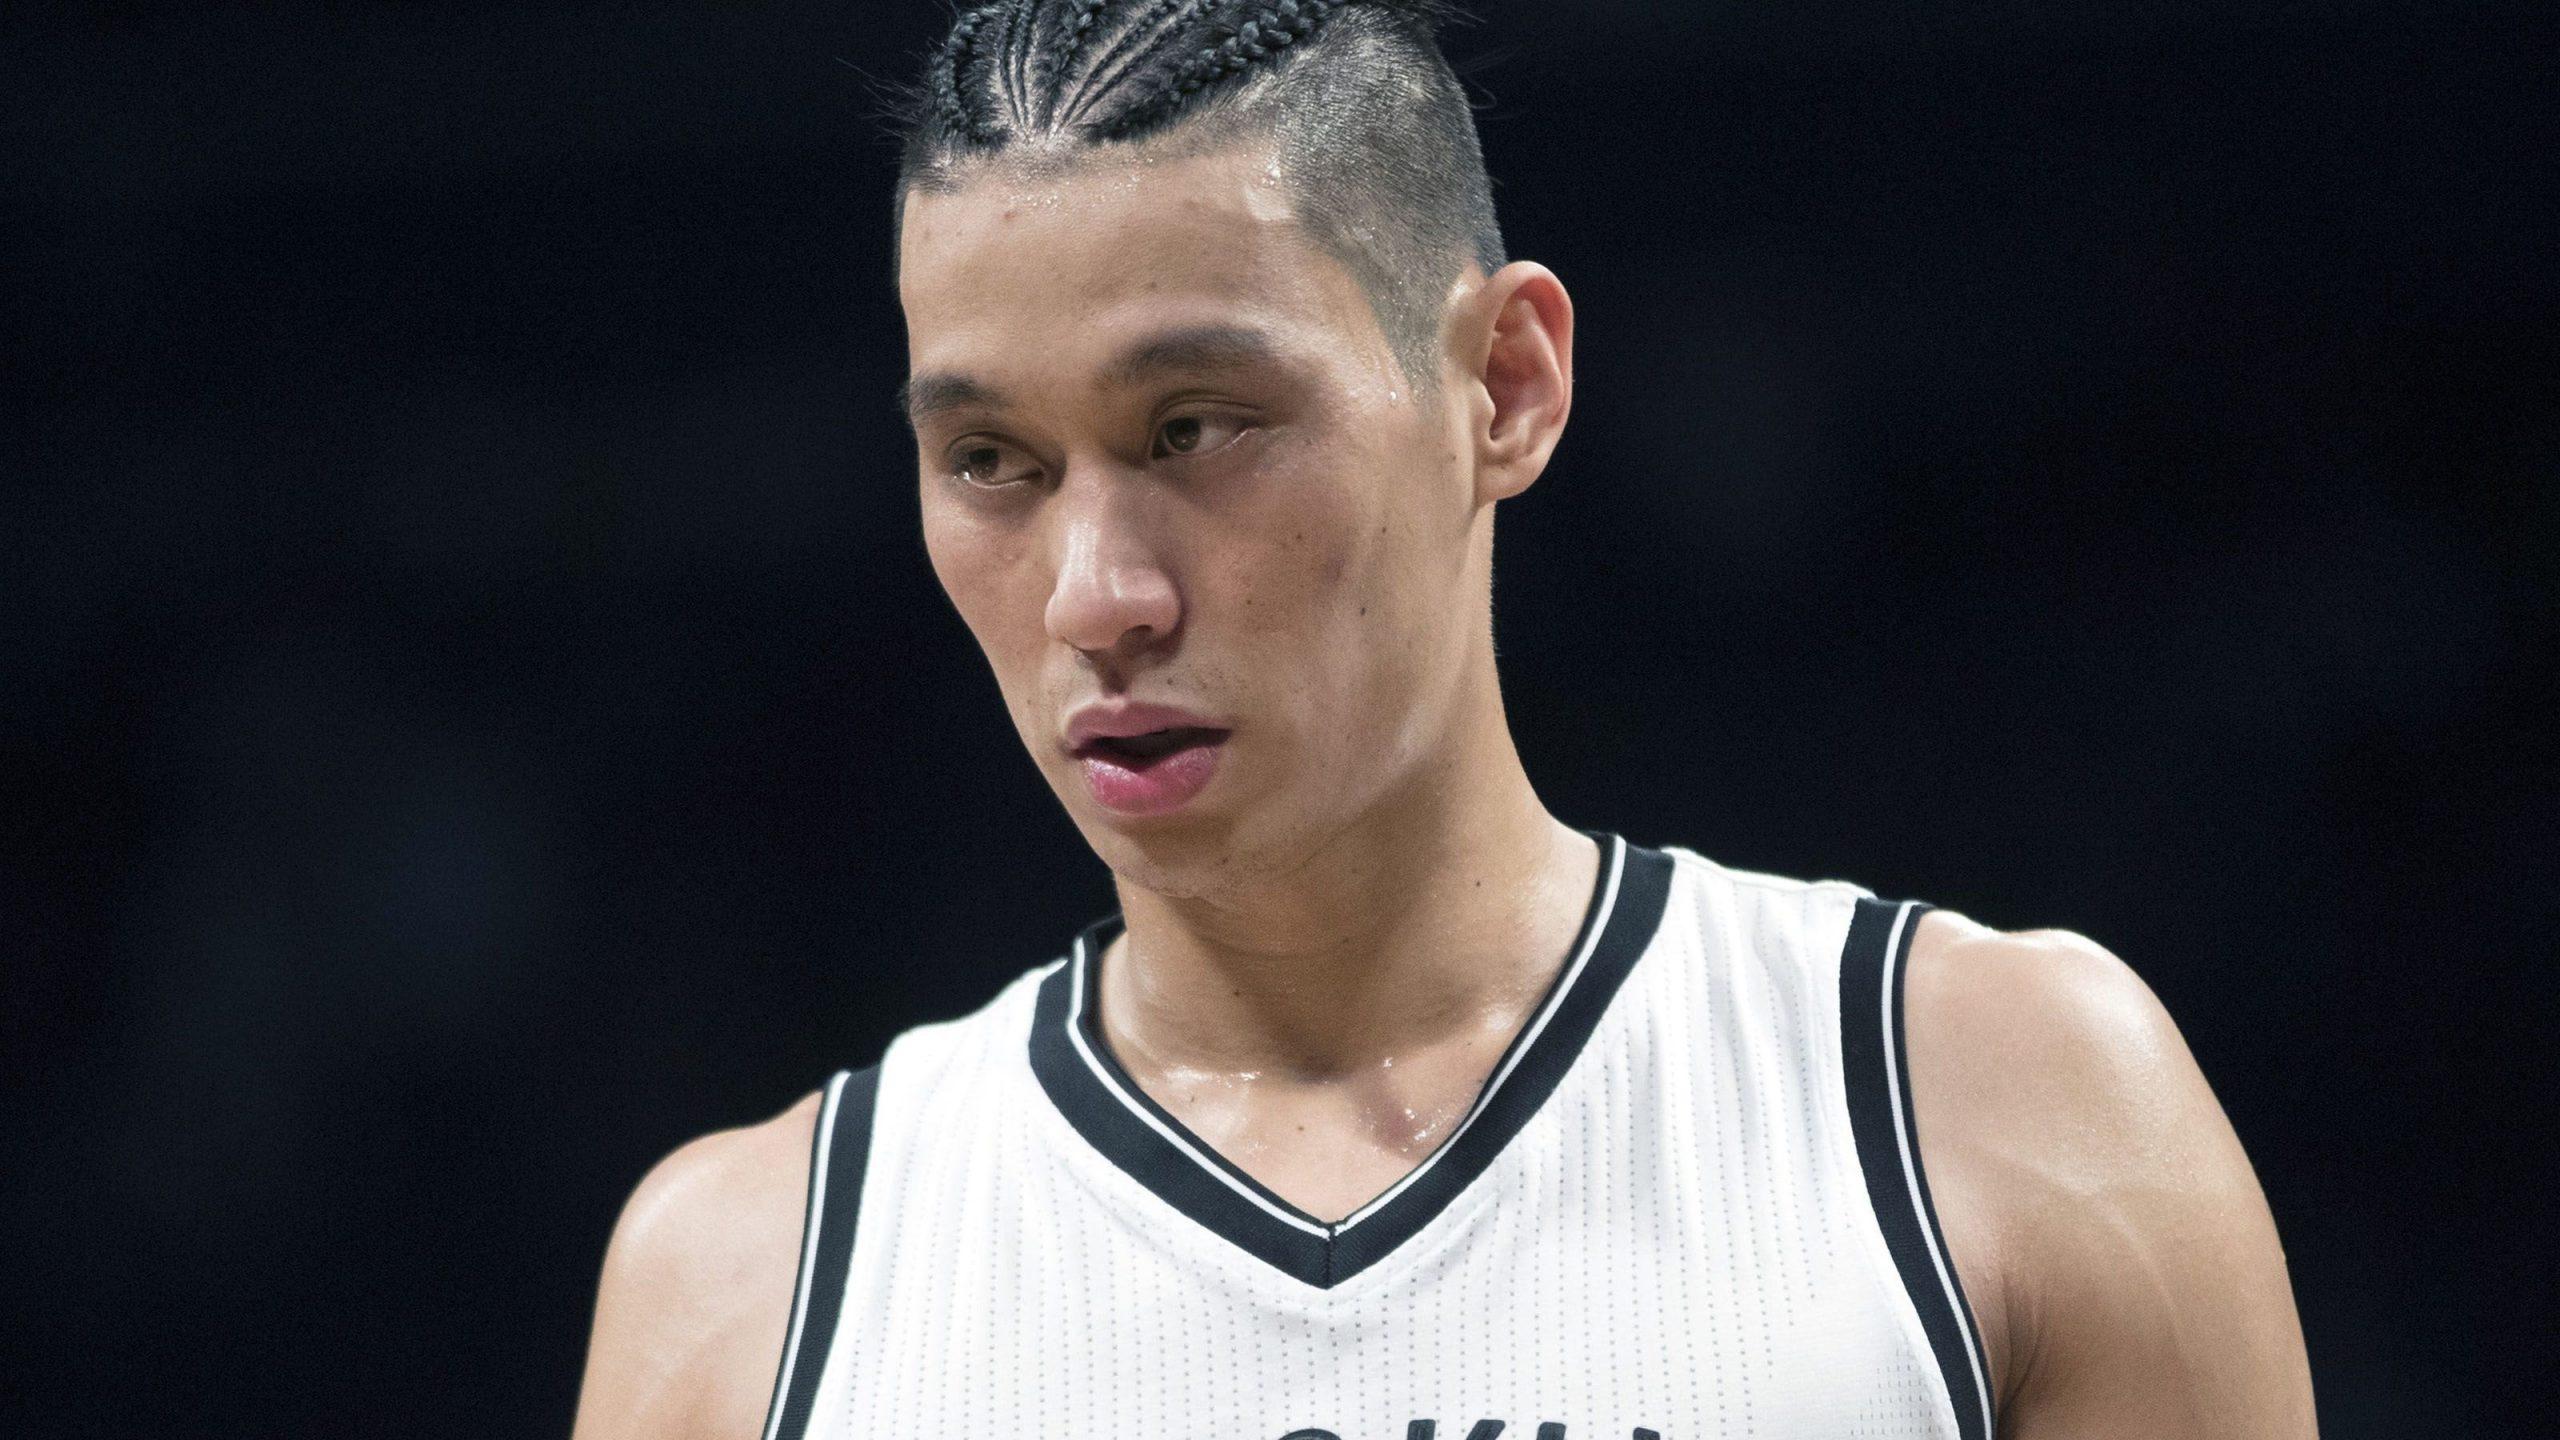 Jeremy Lin Net Worth